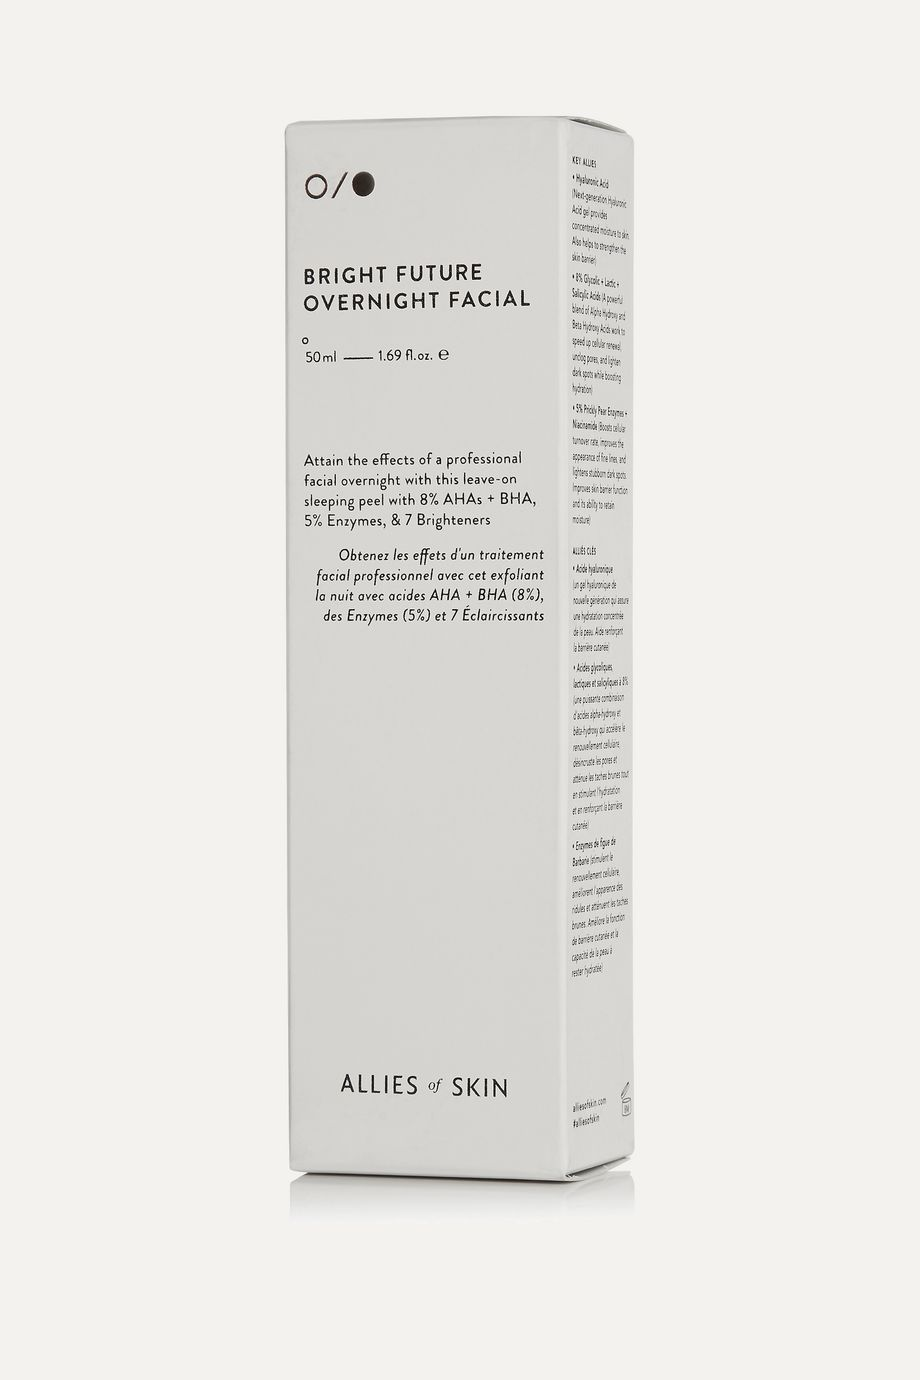 Allies of Skin Bright Future Sleeping Facial, 50ml